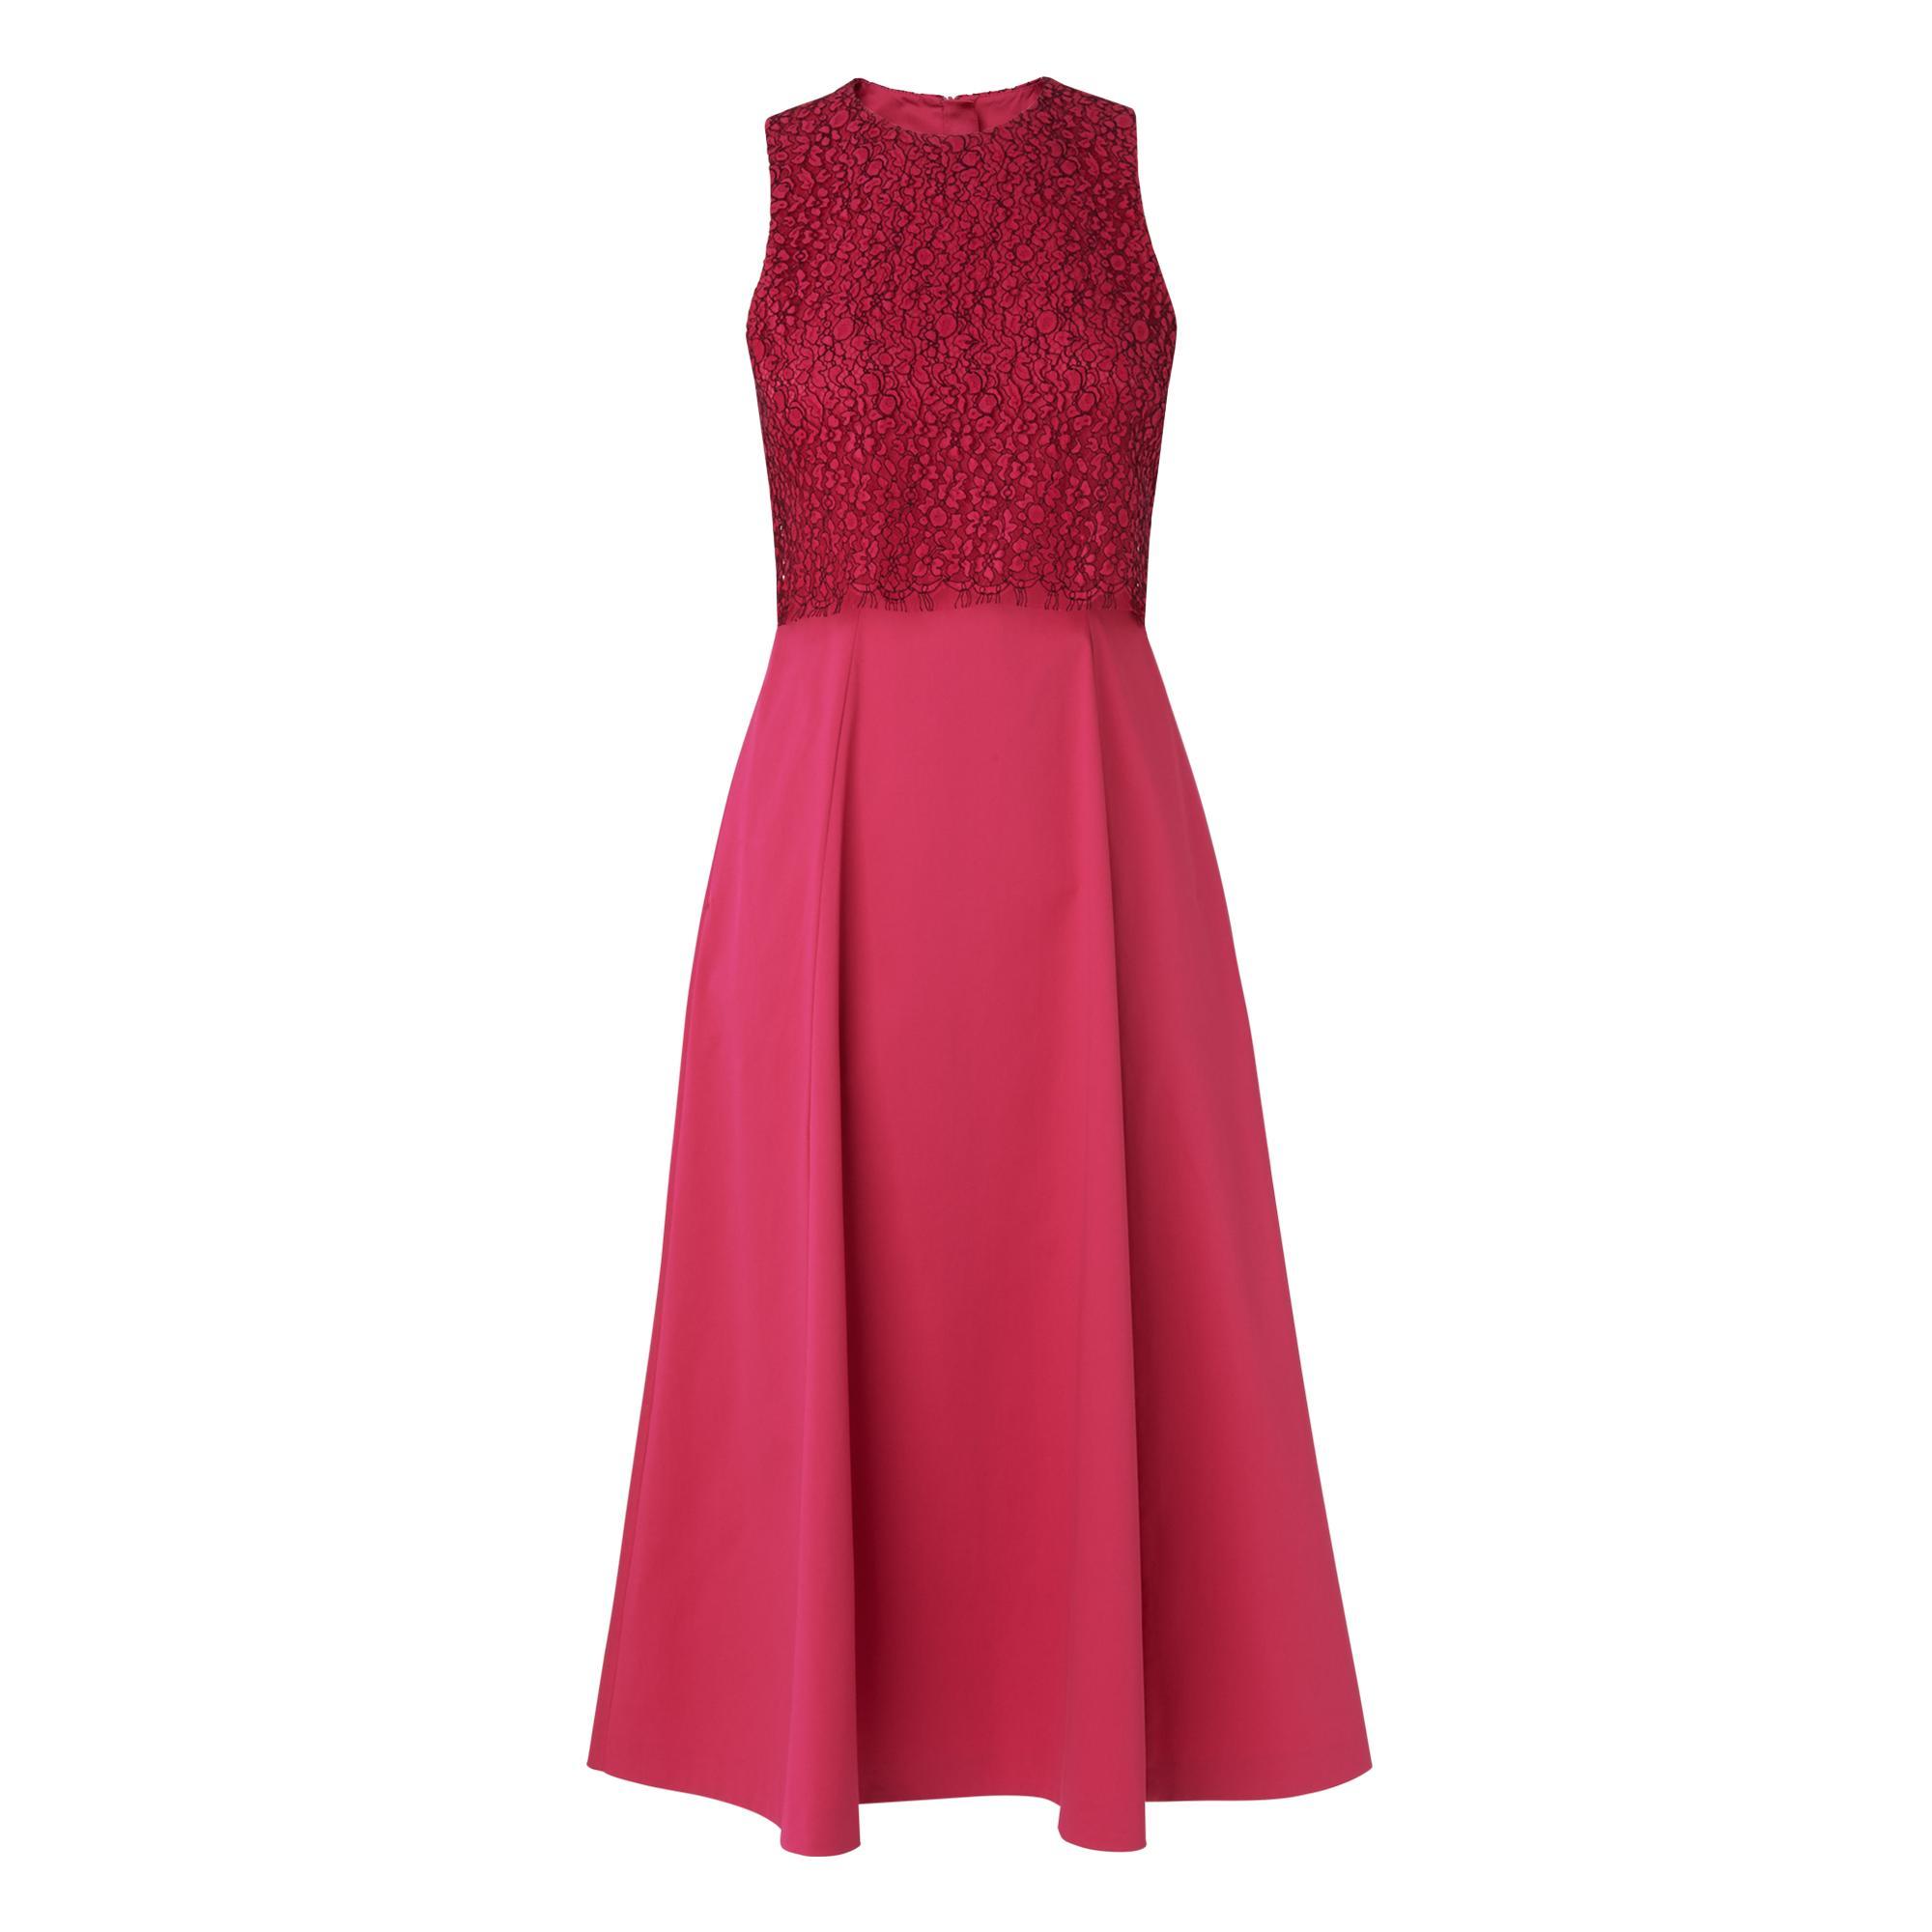 Alecia Pink Cotton Dress